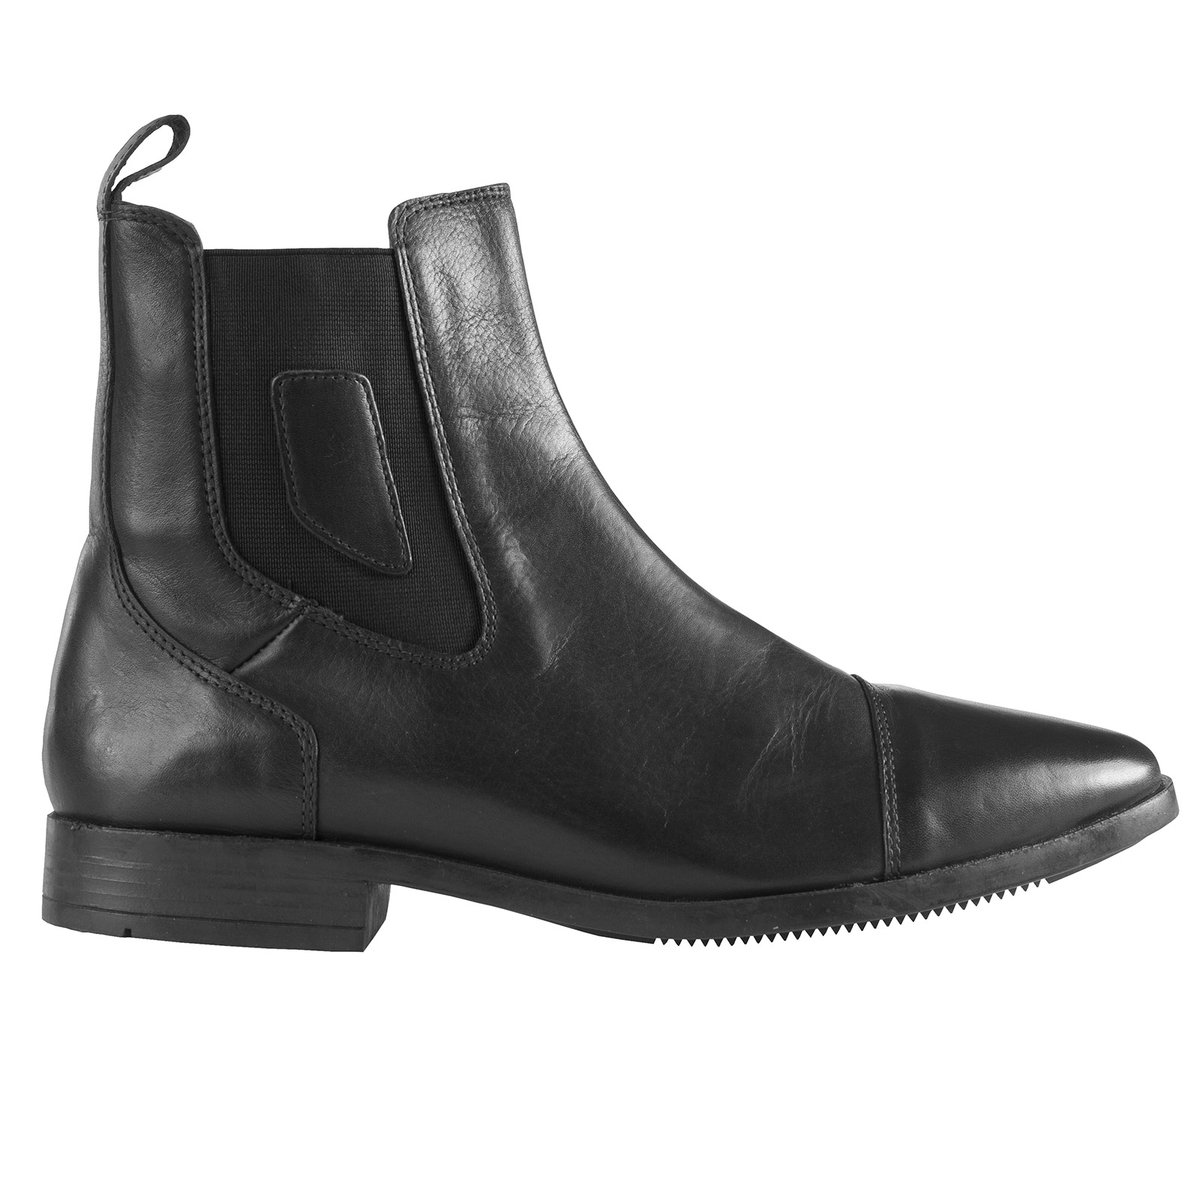 Horze Jodhpur Pull-On Boot with Steel Toe B00CUHWPIG 9.5|Black